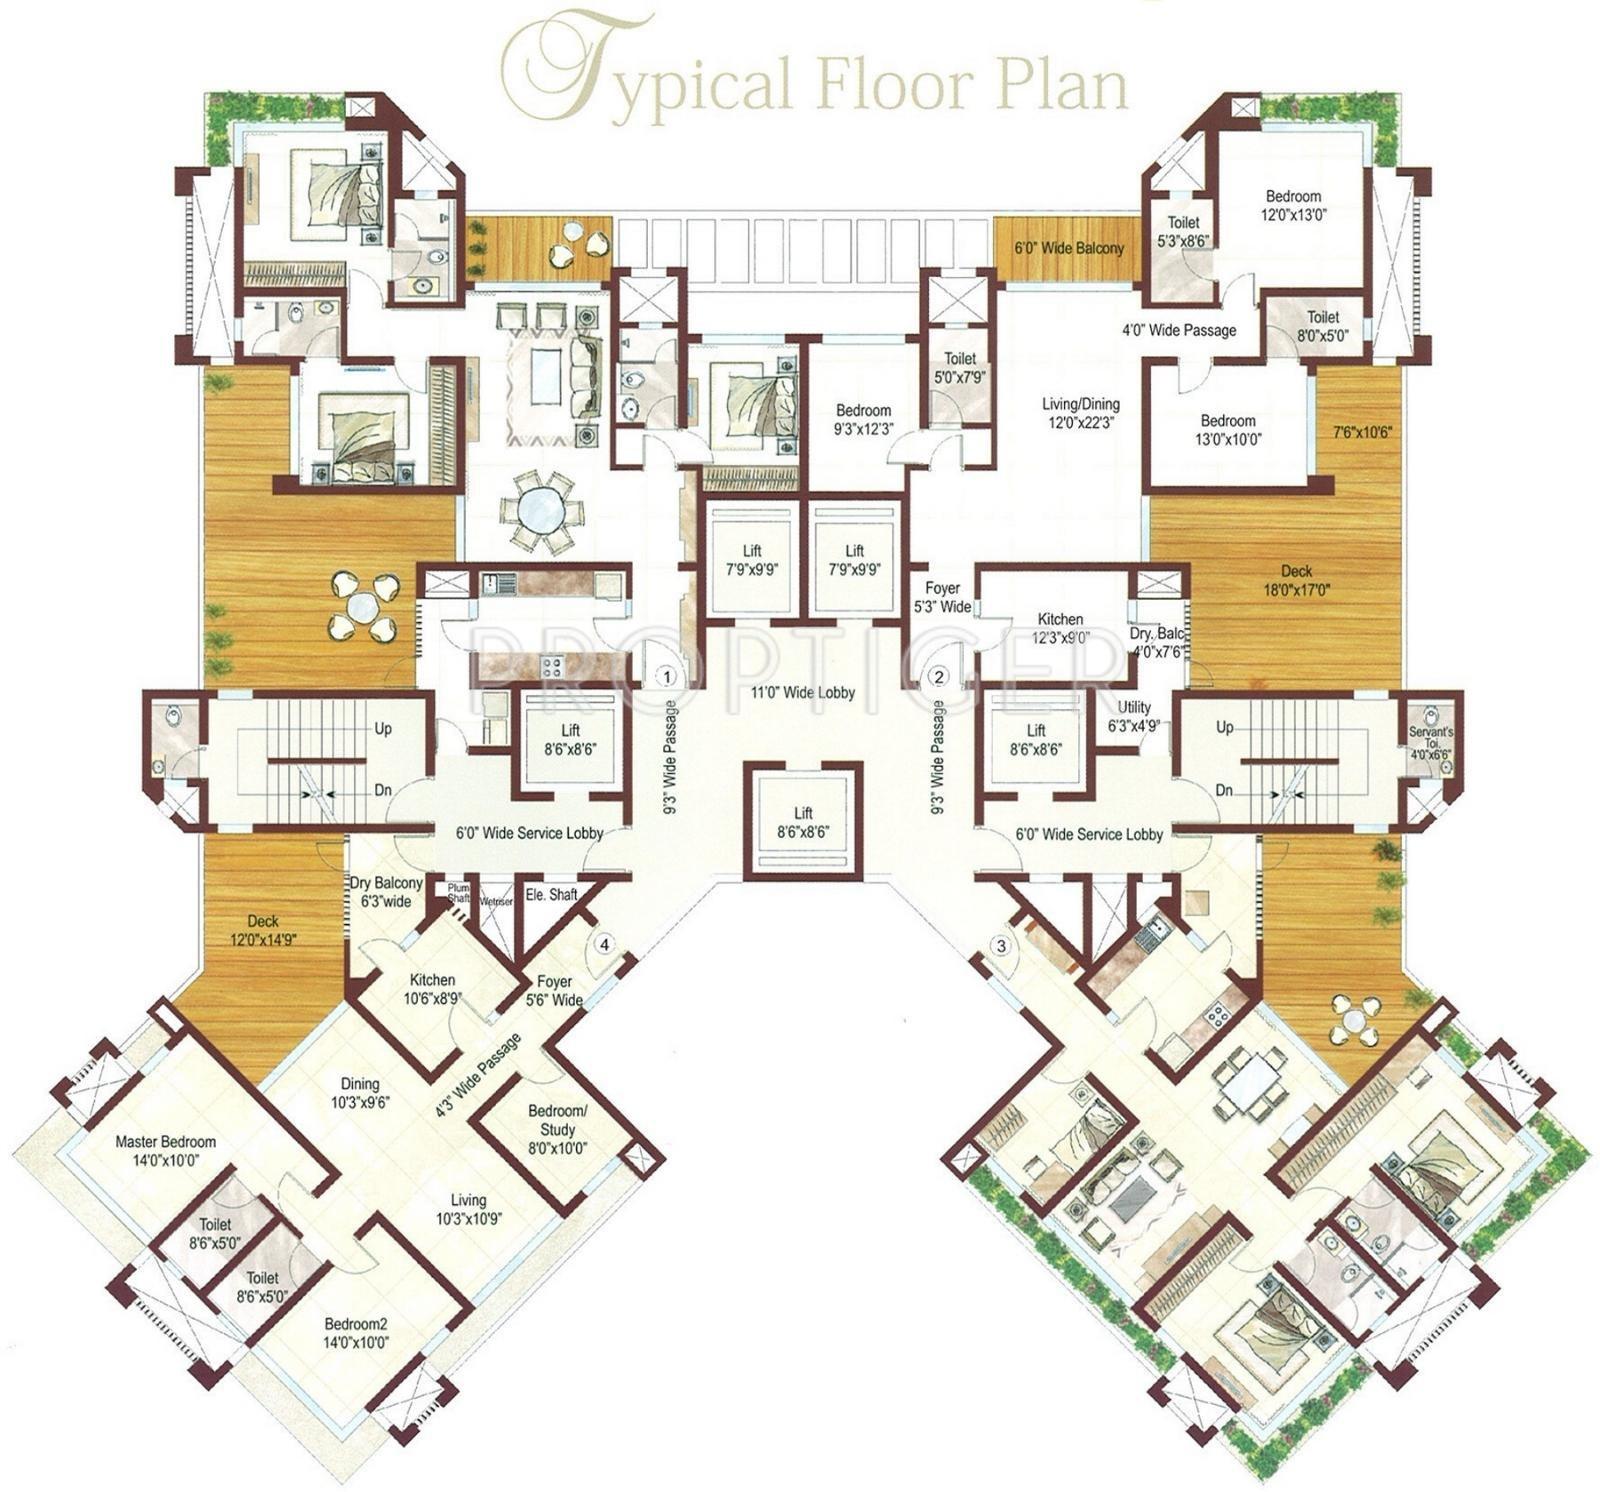 Ashford Royale Floor Plan Unique Garages